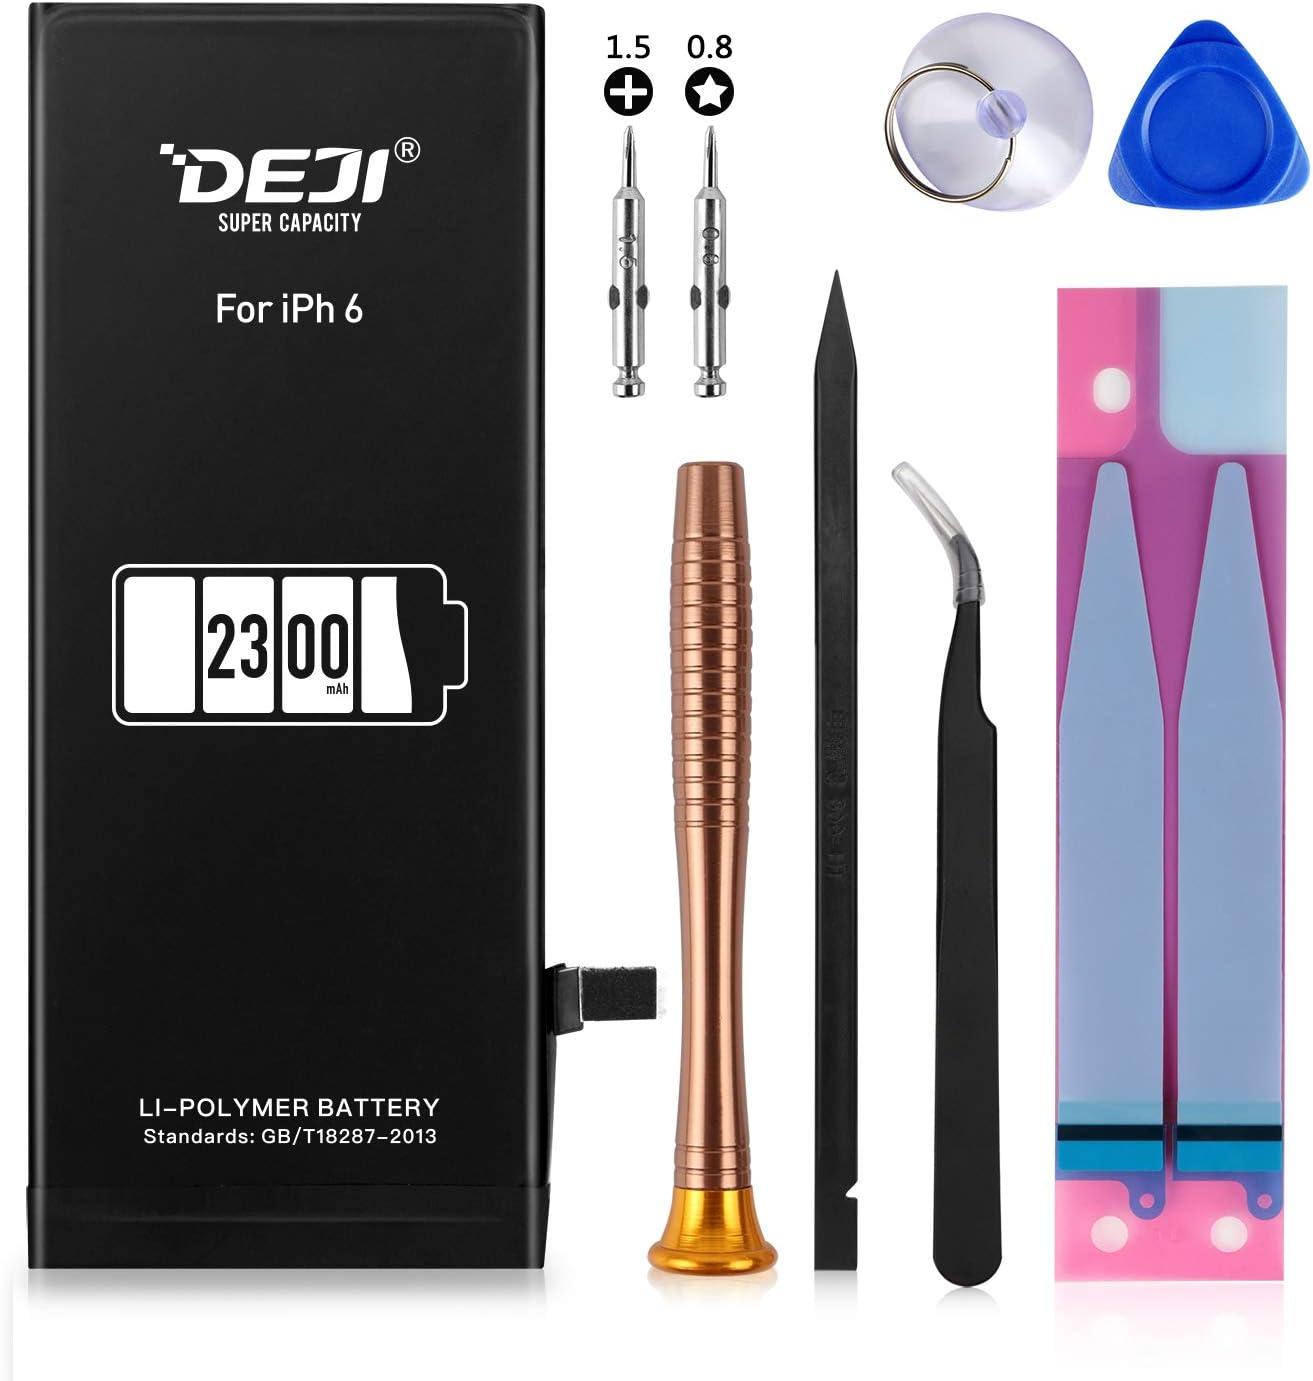 DEJI Battery for iPhone 6, 2300mAh High Capacity Replacement Battery for iPhone 6 A1549, A1586, A1589, with Professional Repair Tool Kit and Instructions -[2 Year Warranty]